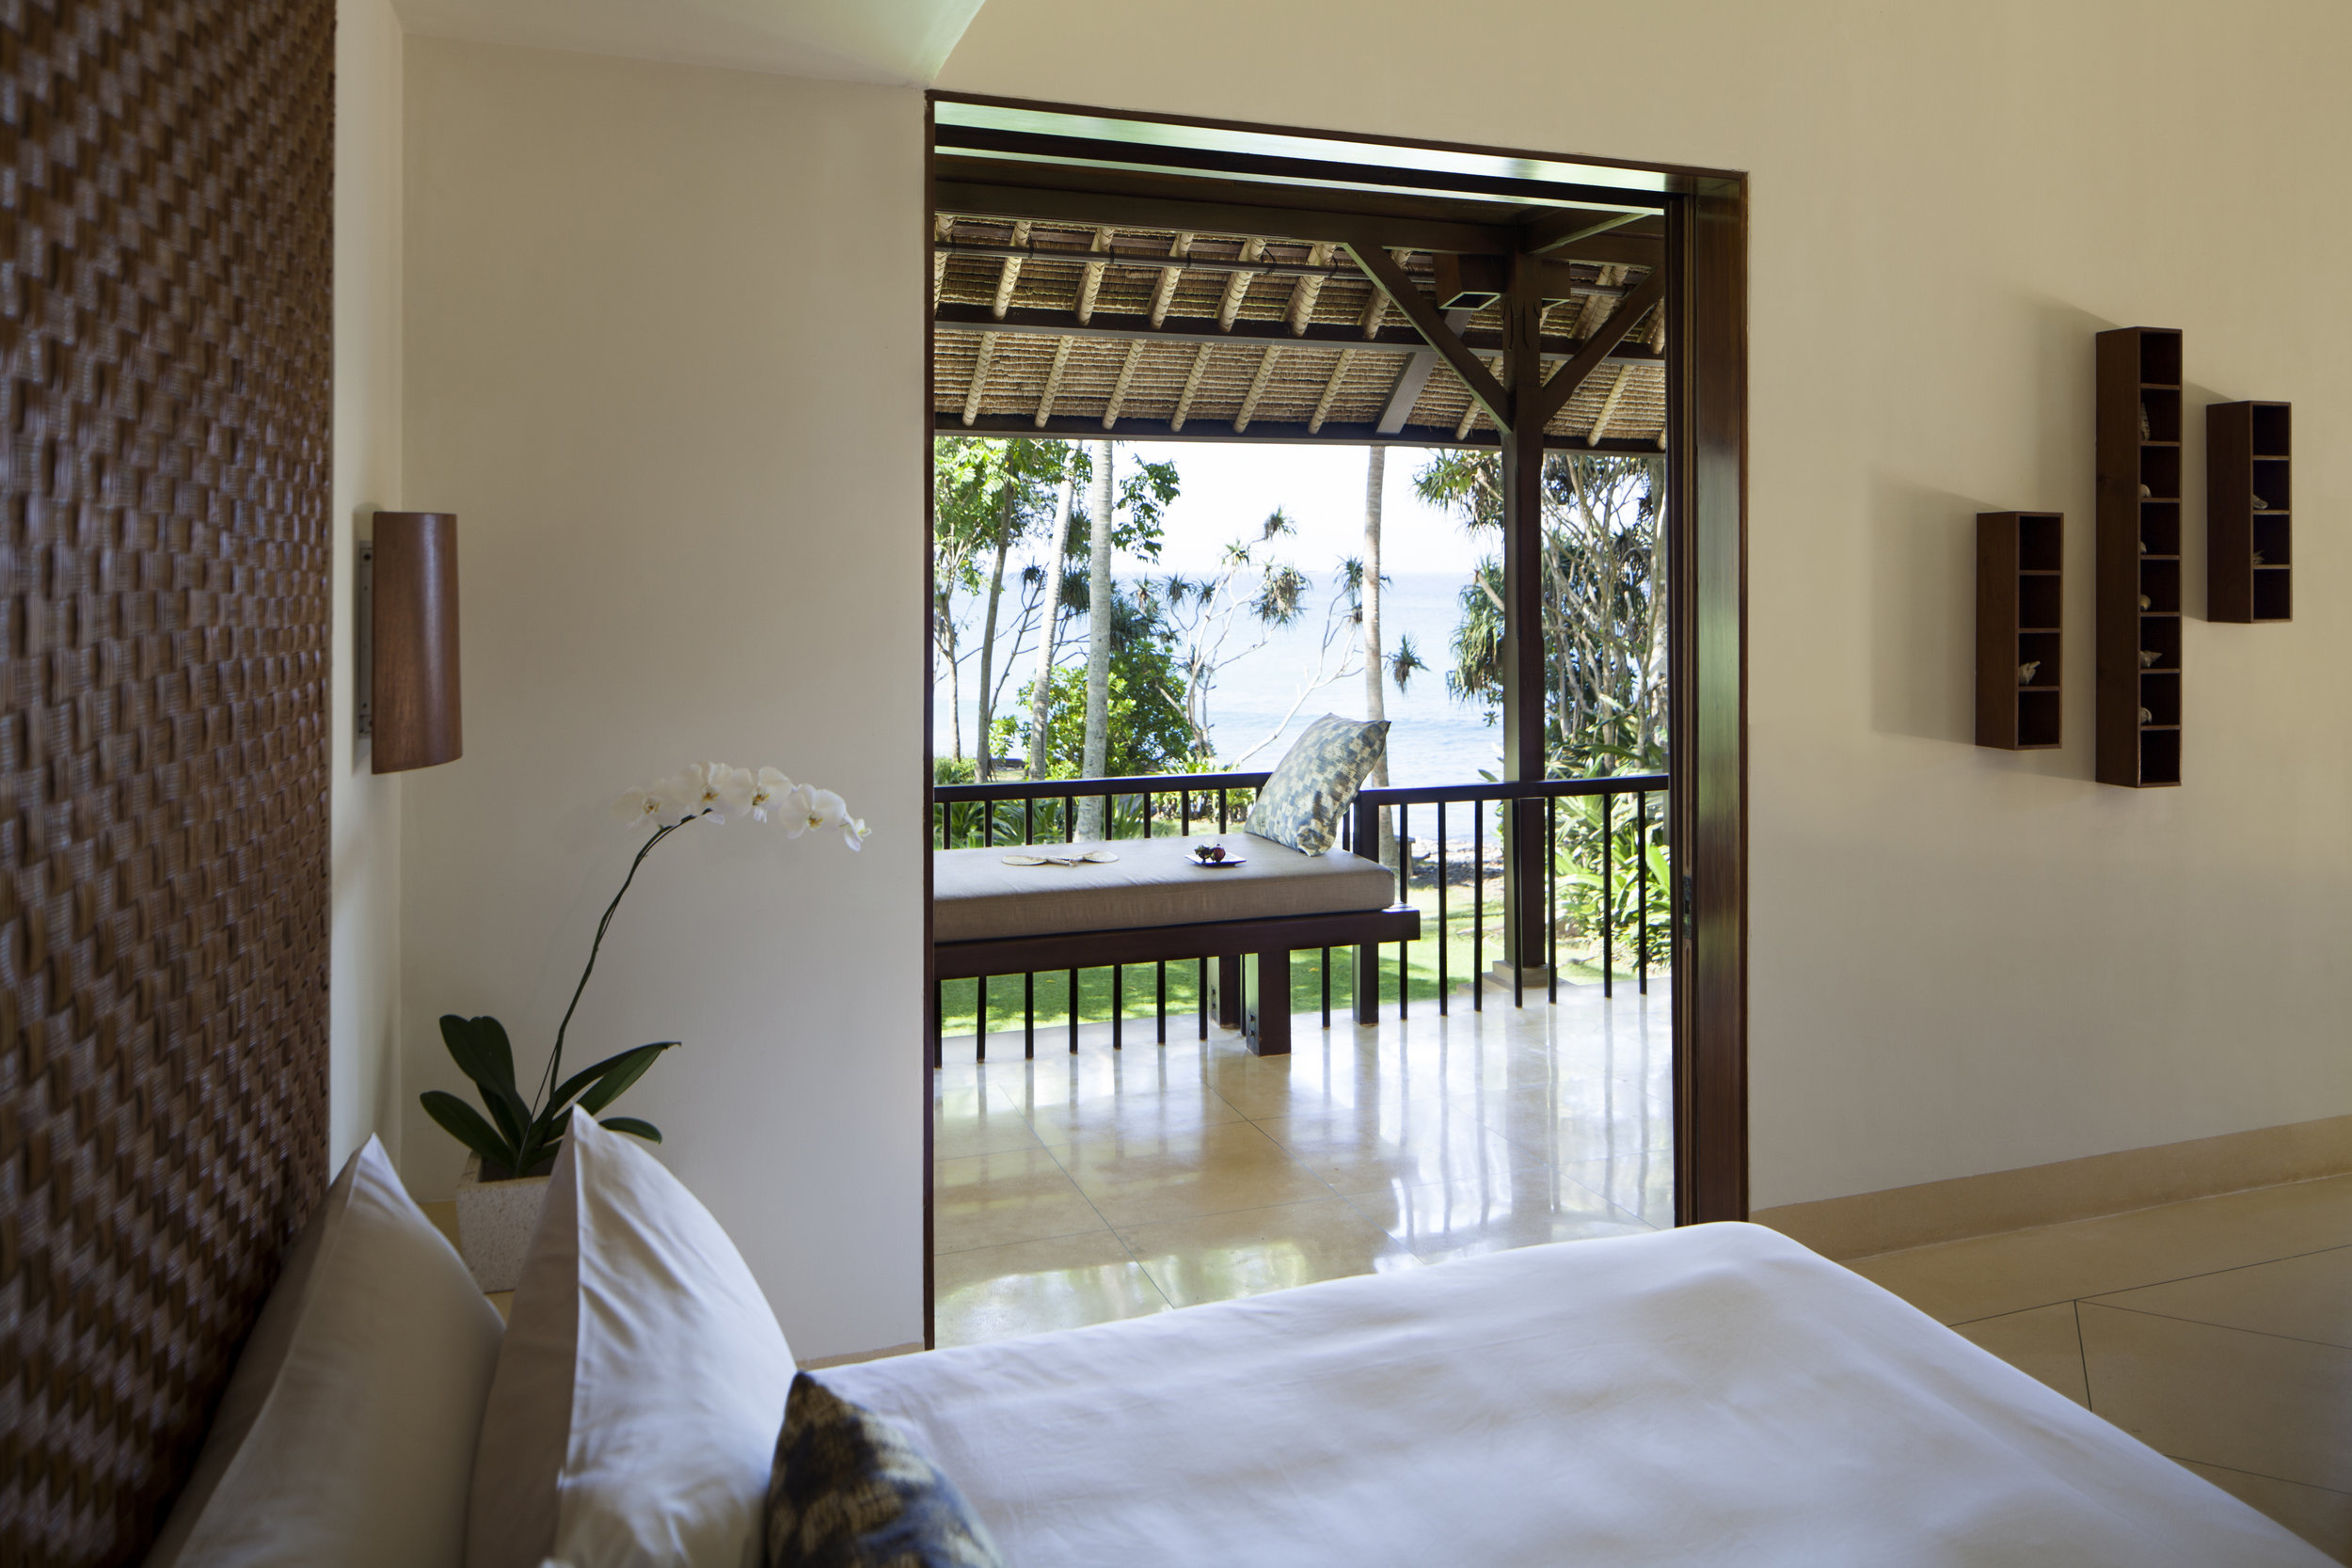 Alila Manggis - Accommodation - Seaside Suite Balcony.jpg